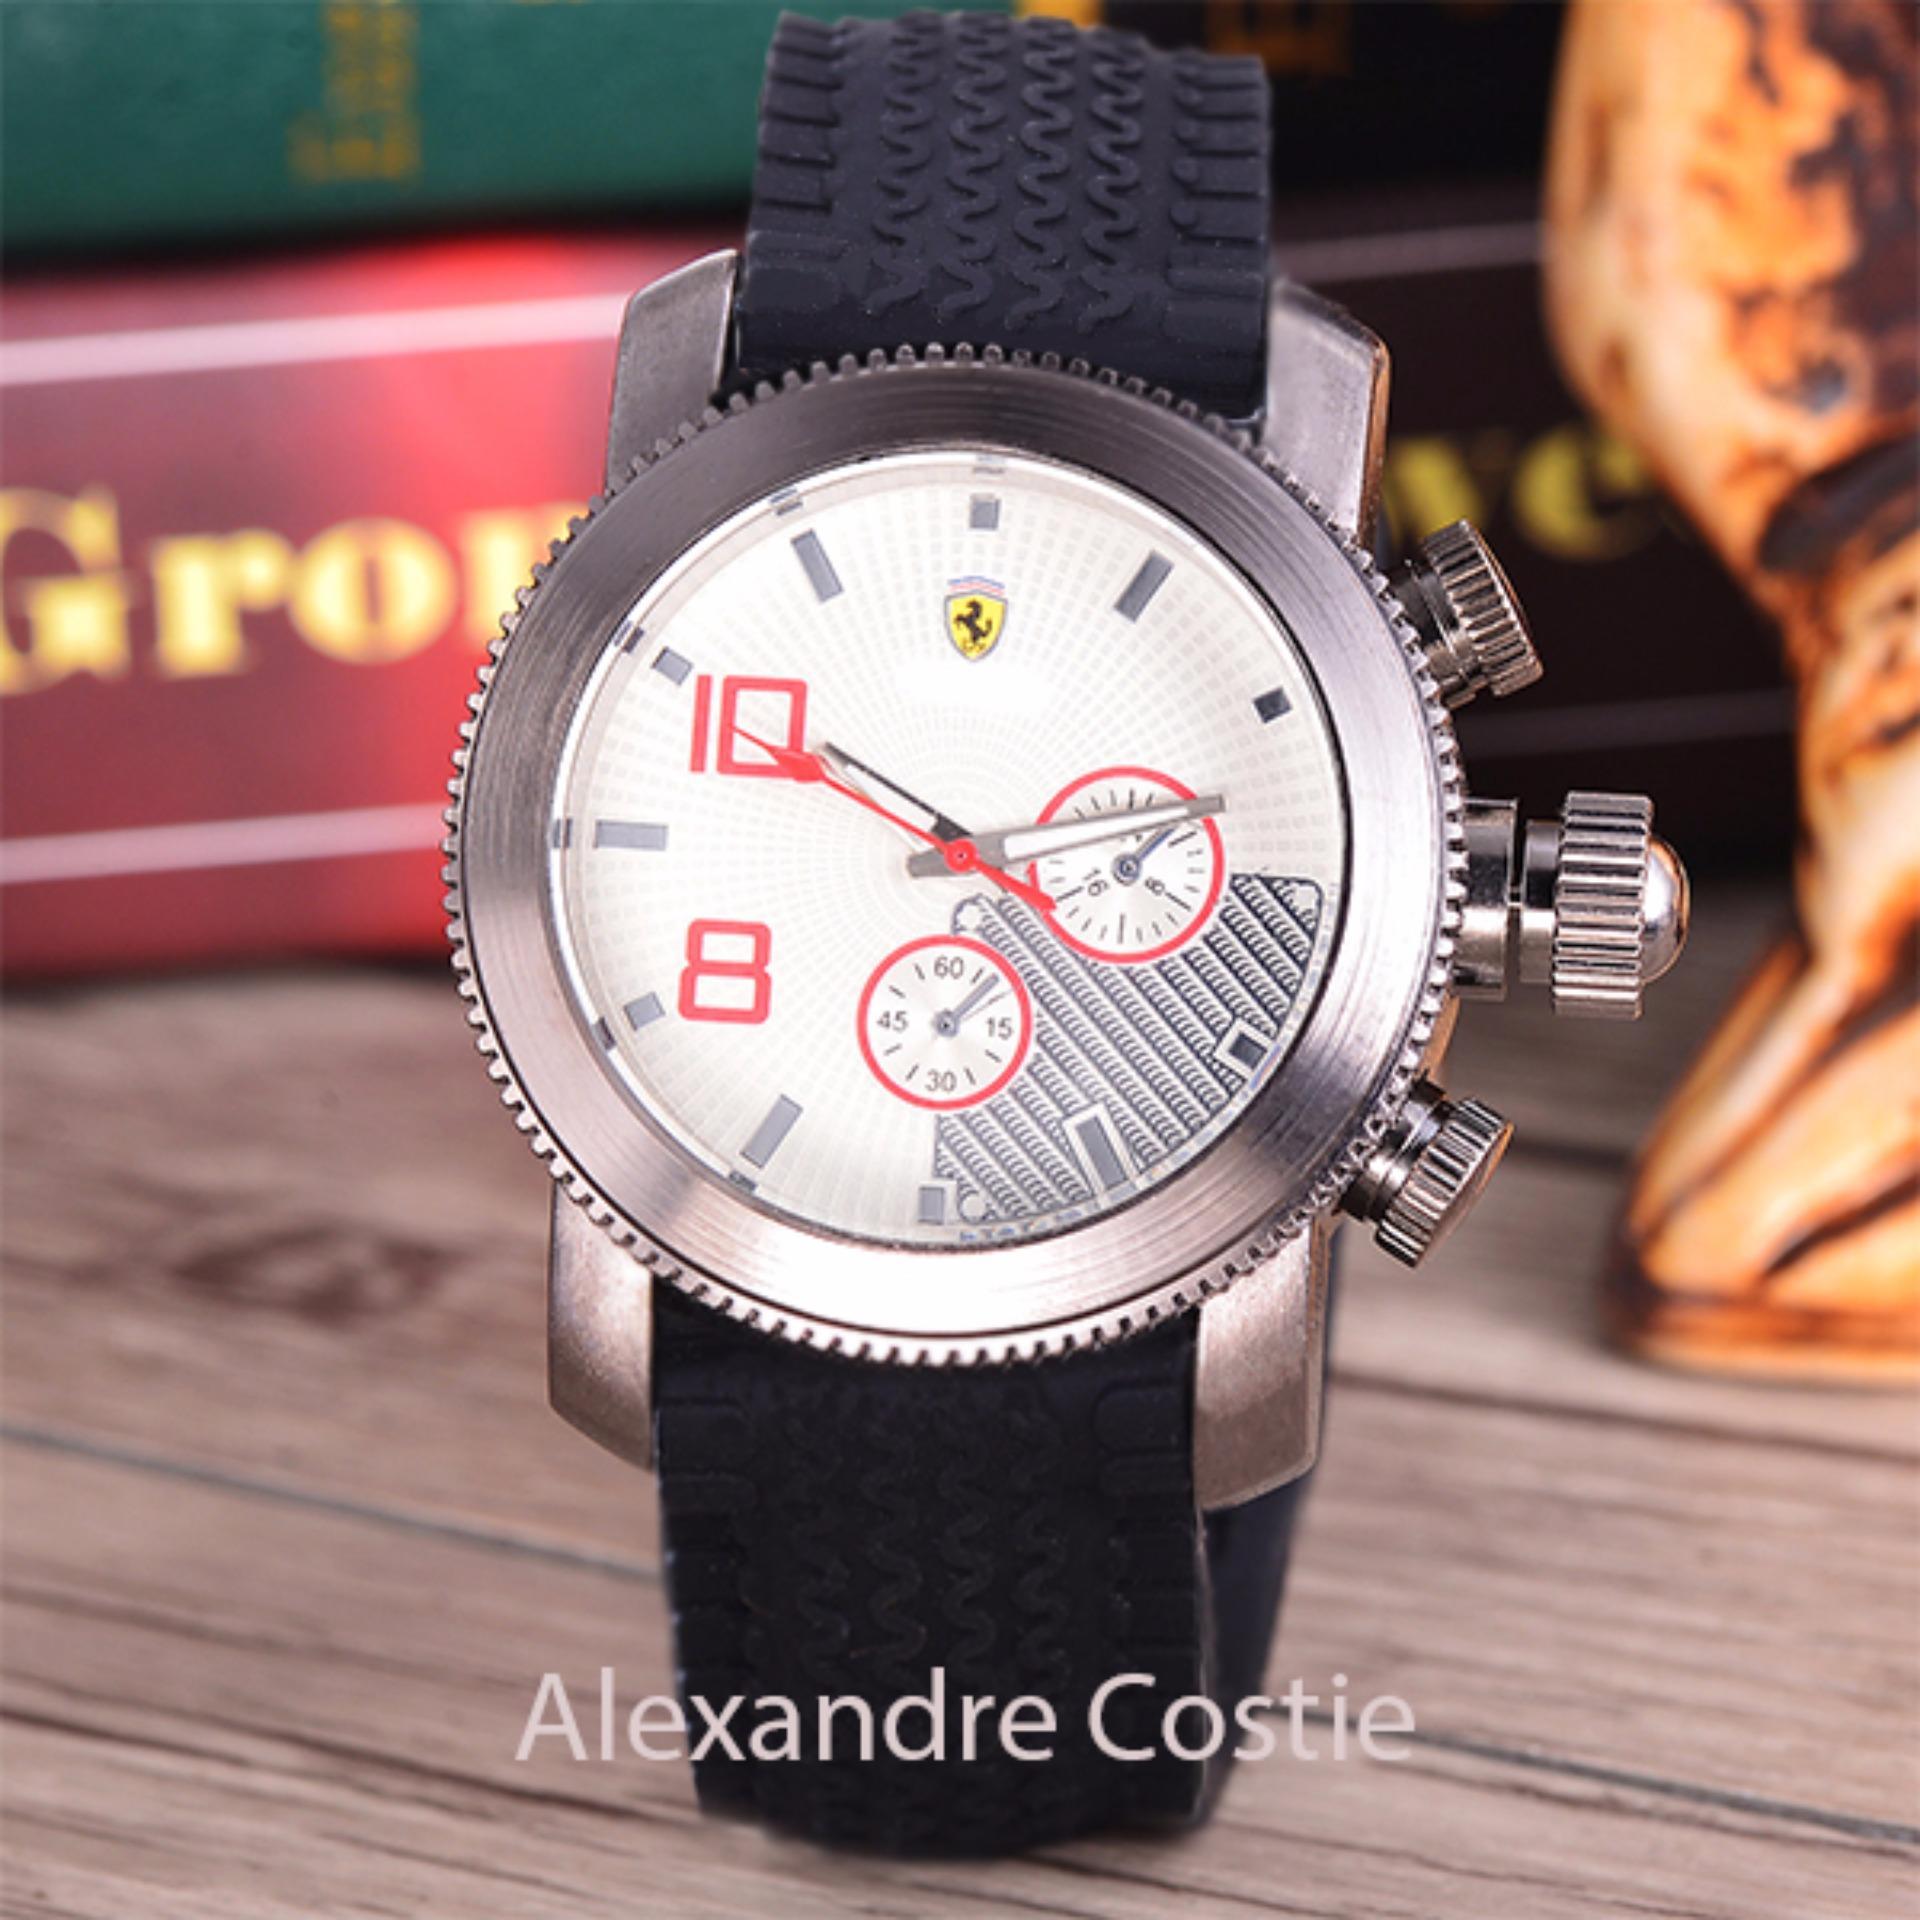 Alexandre Costie Original Brand Jam Tangan Pria Body Silver Black Christie Ac668lw Bandingkan Toko White Dial